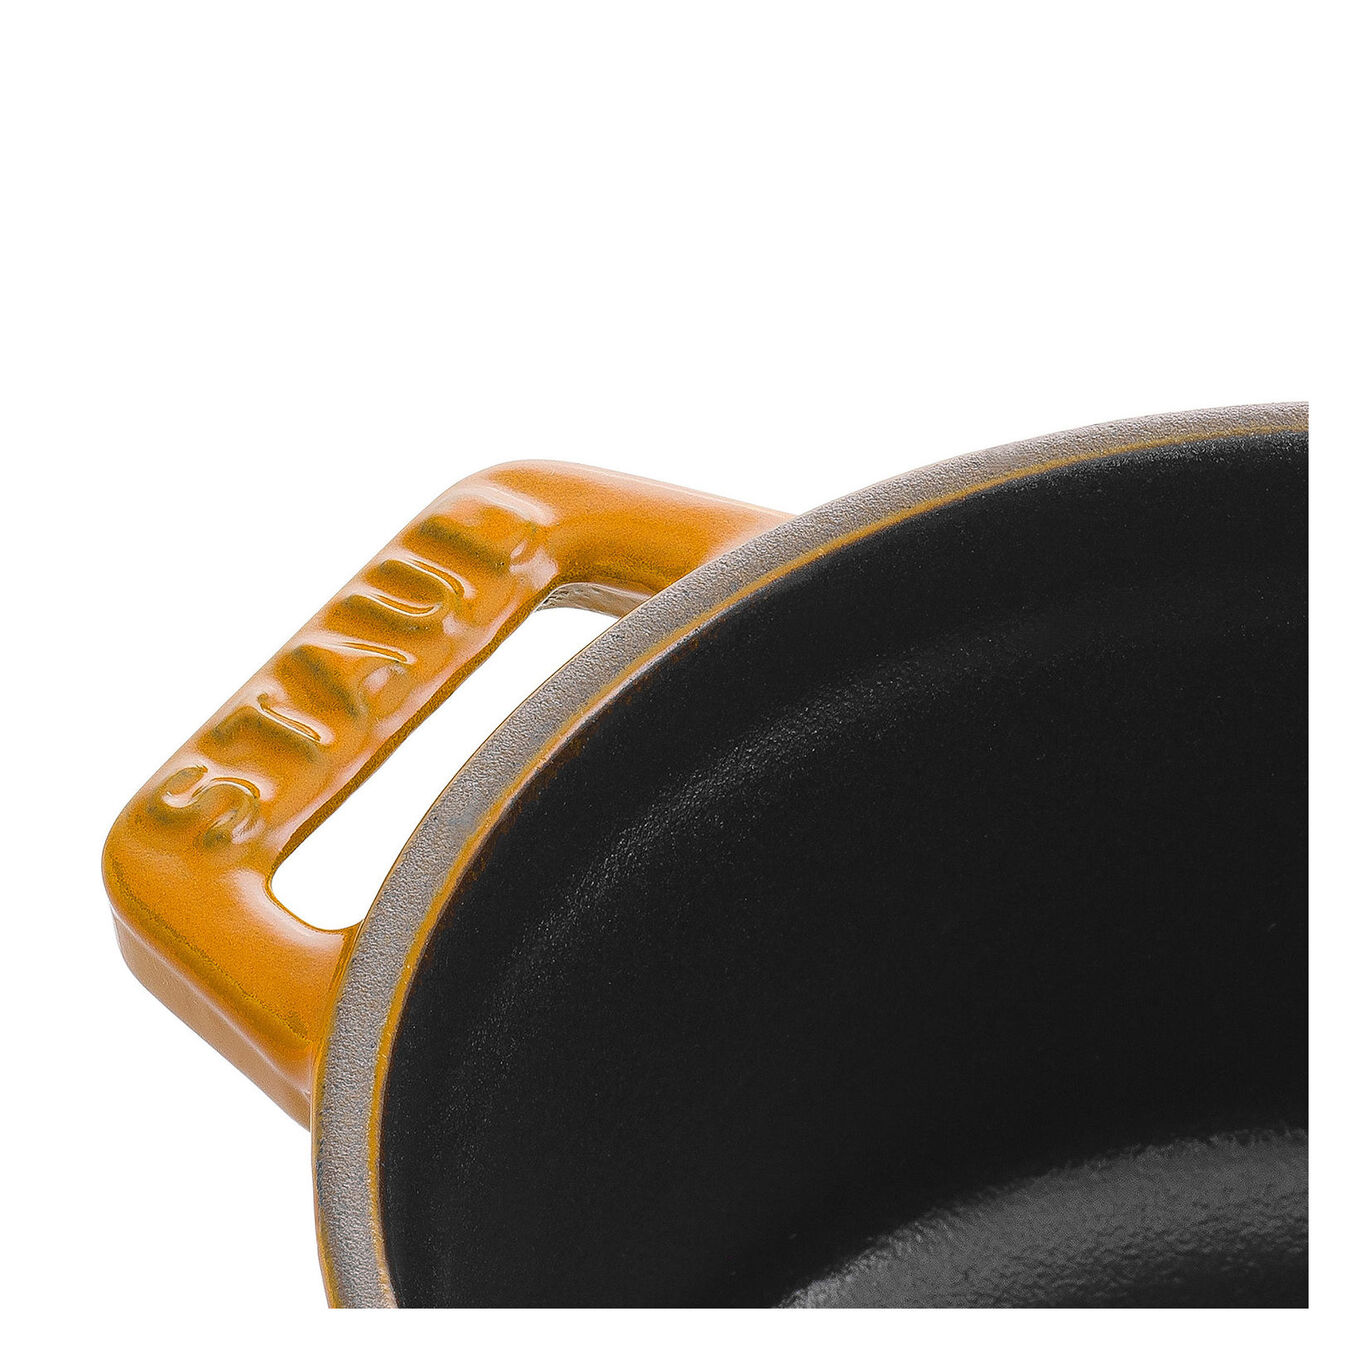 Mini Cocotte 10 cm, rund, Senf, Gusseisen,,large 3